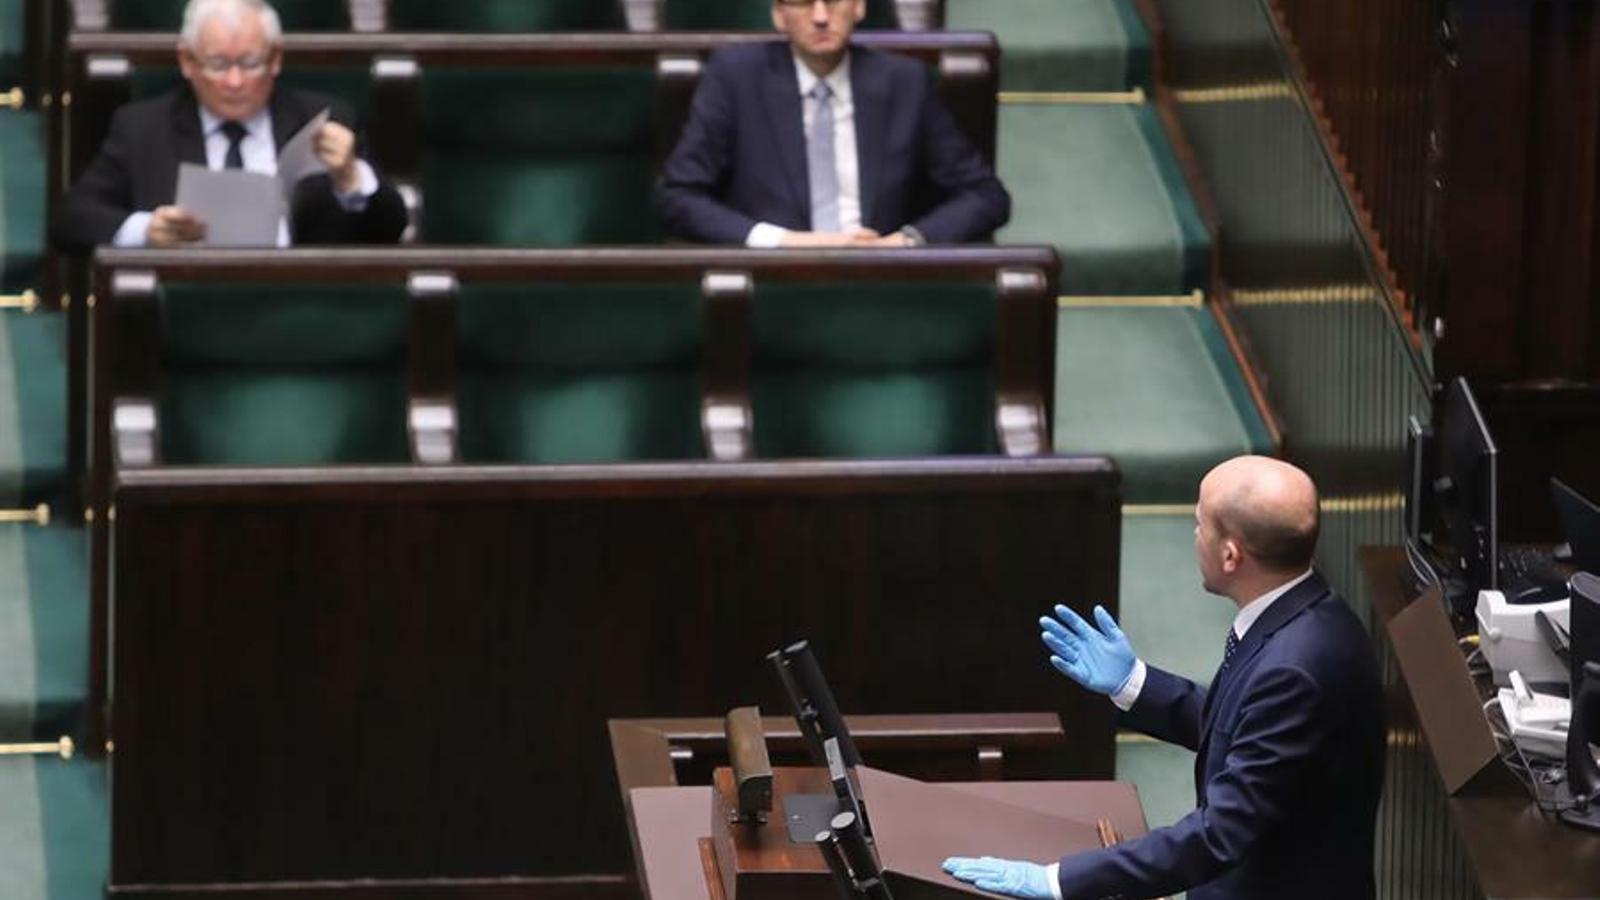 Jaroslaw Kaczynski llegint un documents durant la sessió parlamentària a Varsòvia